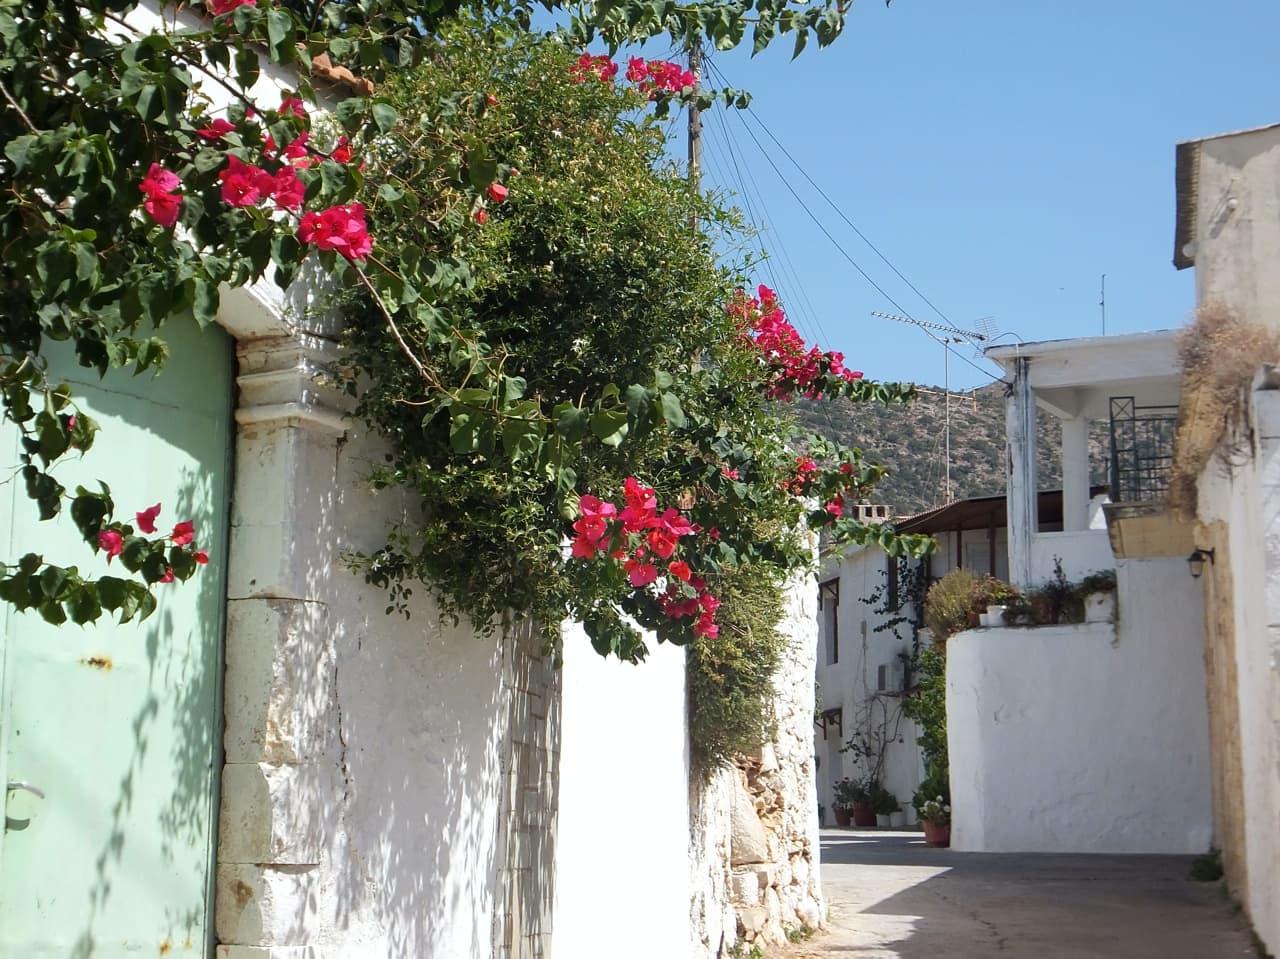 melidoni village crete, melidoni cave, gerontospilios melidoni cave rethimno, melidoni village things to see do